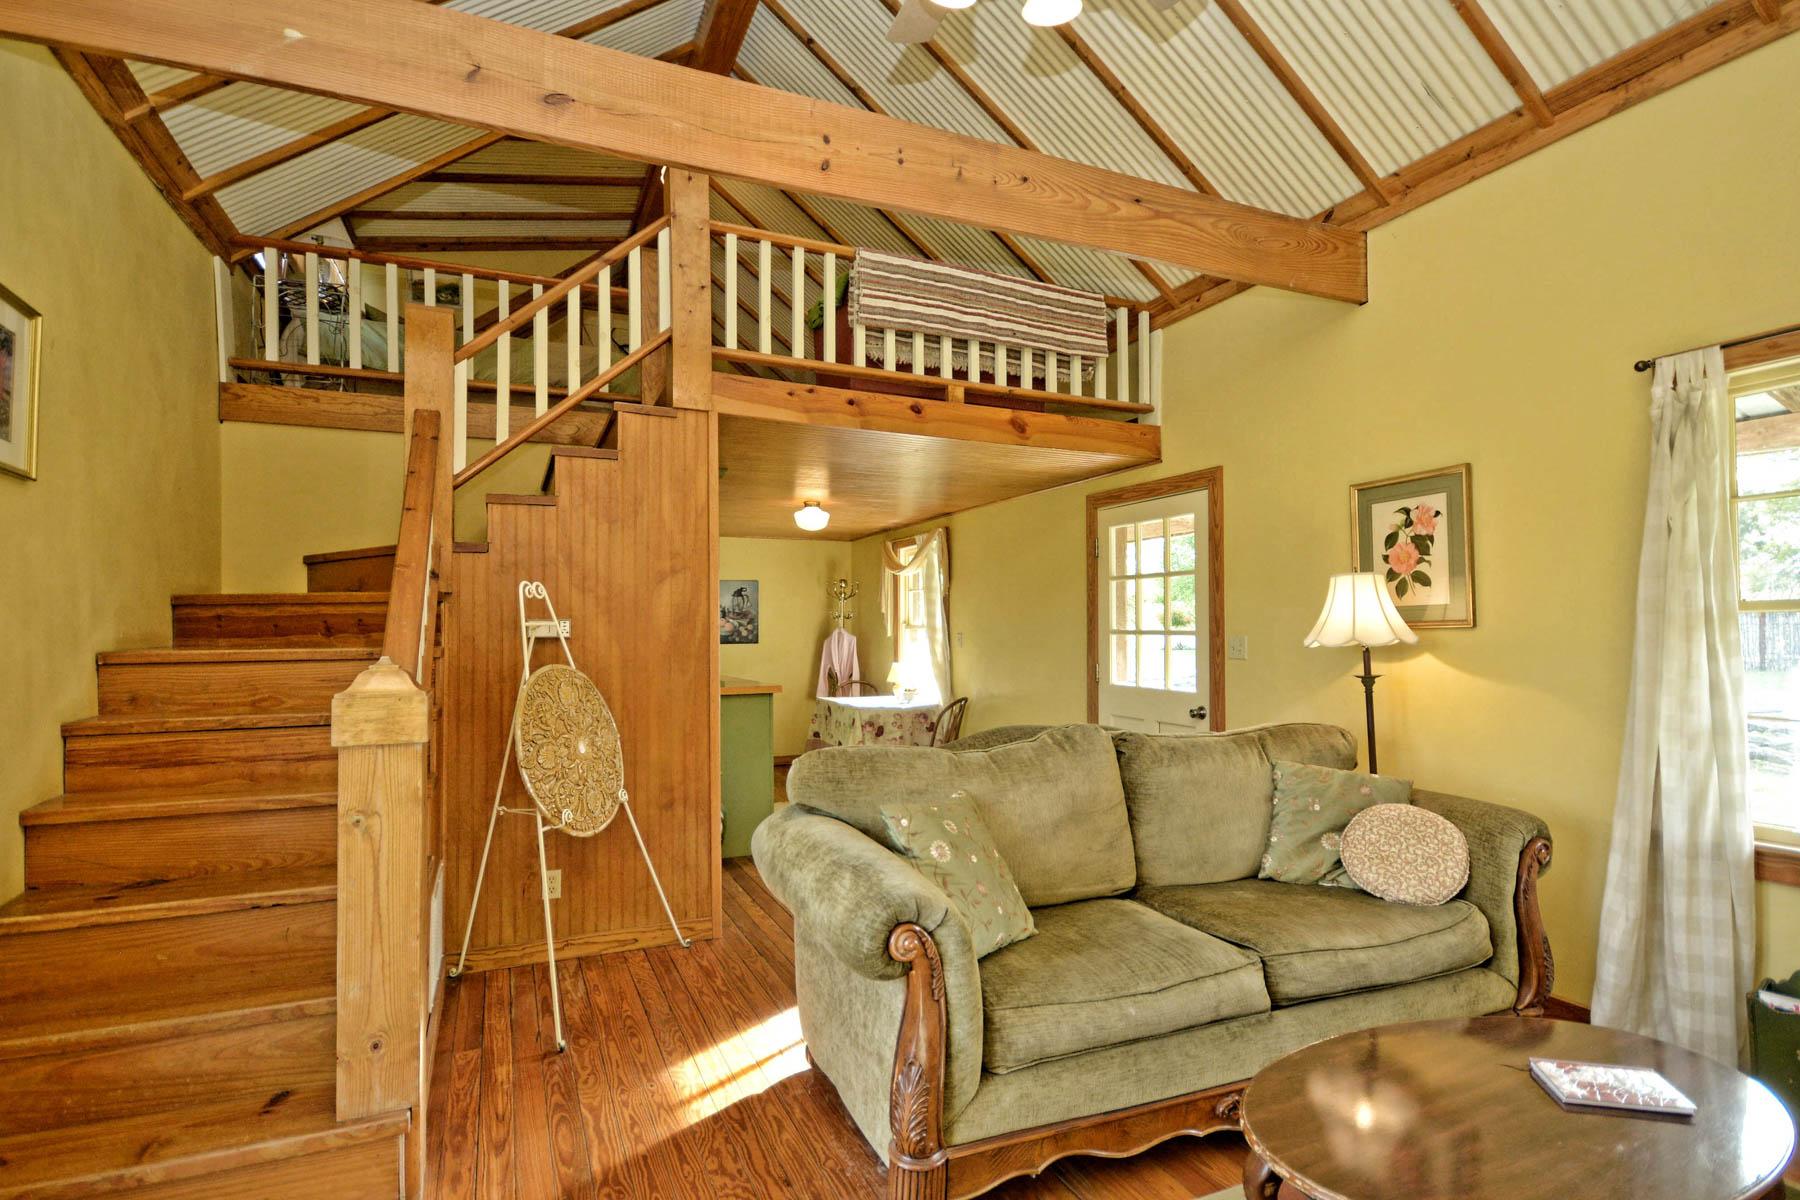 Additional photo for property listing at Amazing Fredericksburg Property on 36-+ Acres 457 Bob Moritz Fredericksburg, Texas 78624 Estados Unidos